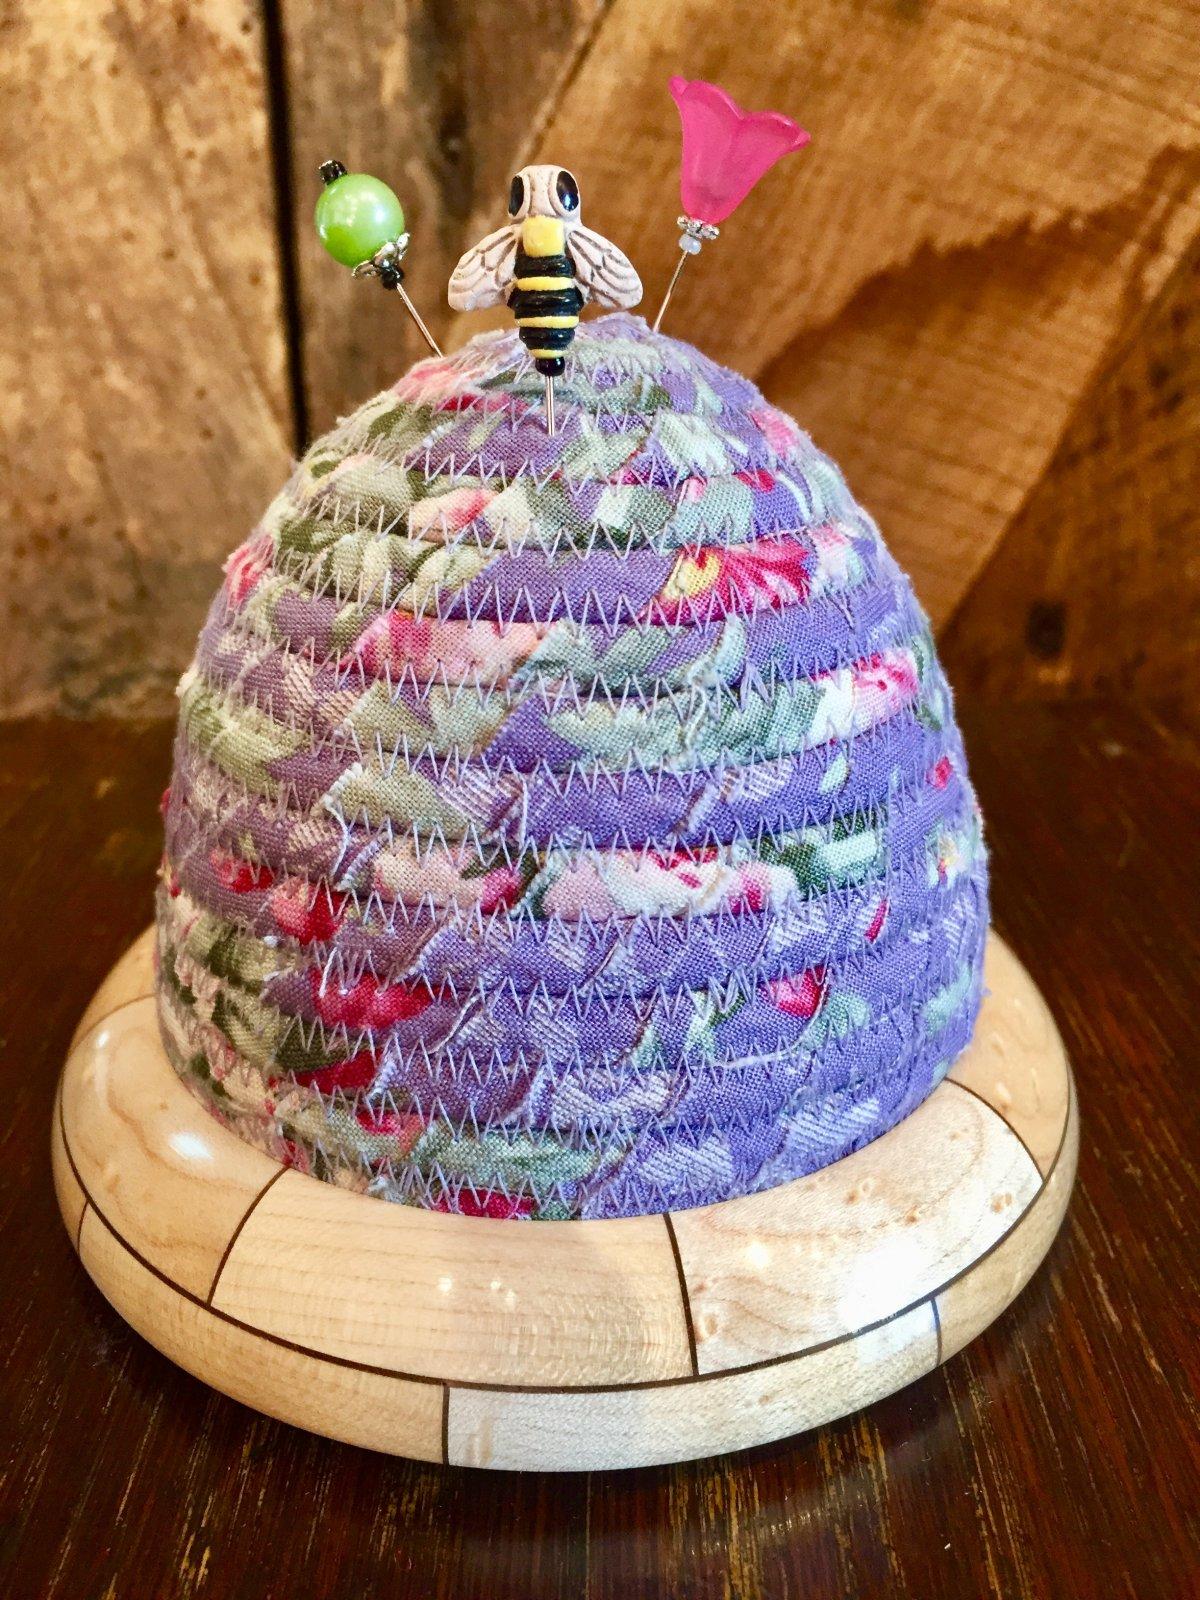 Beehive Pincushion - Woodland by Tilda - Hazel Roses - Lavender - Birdseye Maple / Walnut Wooden Base